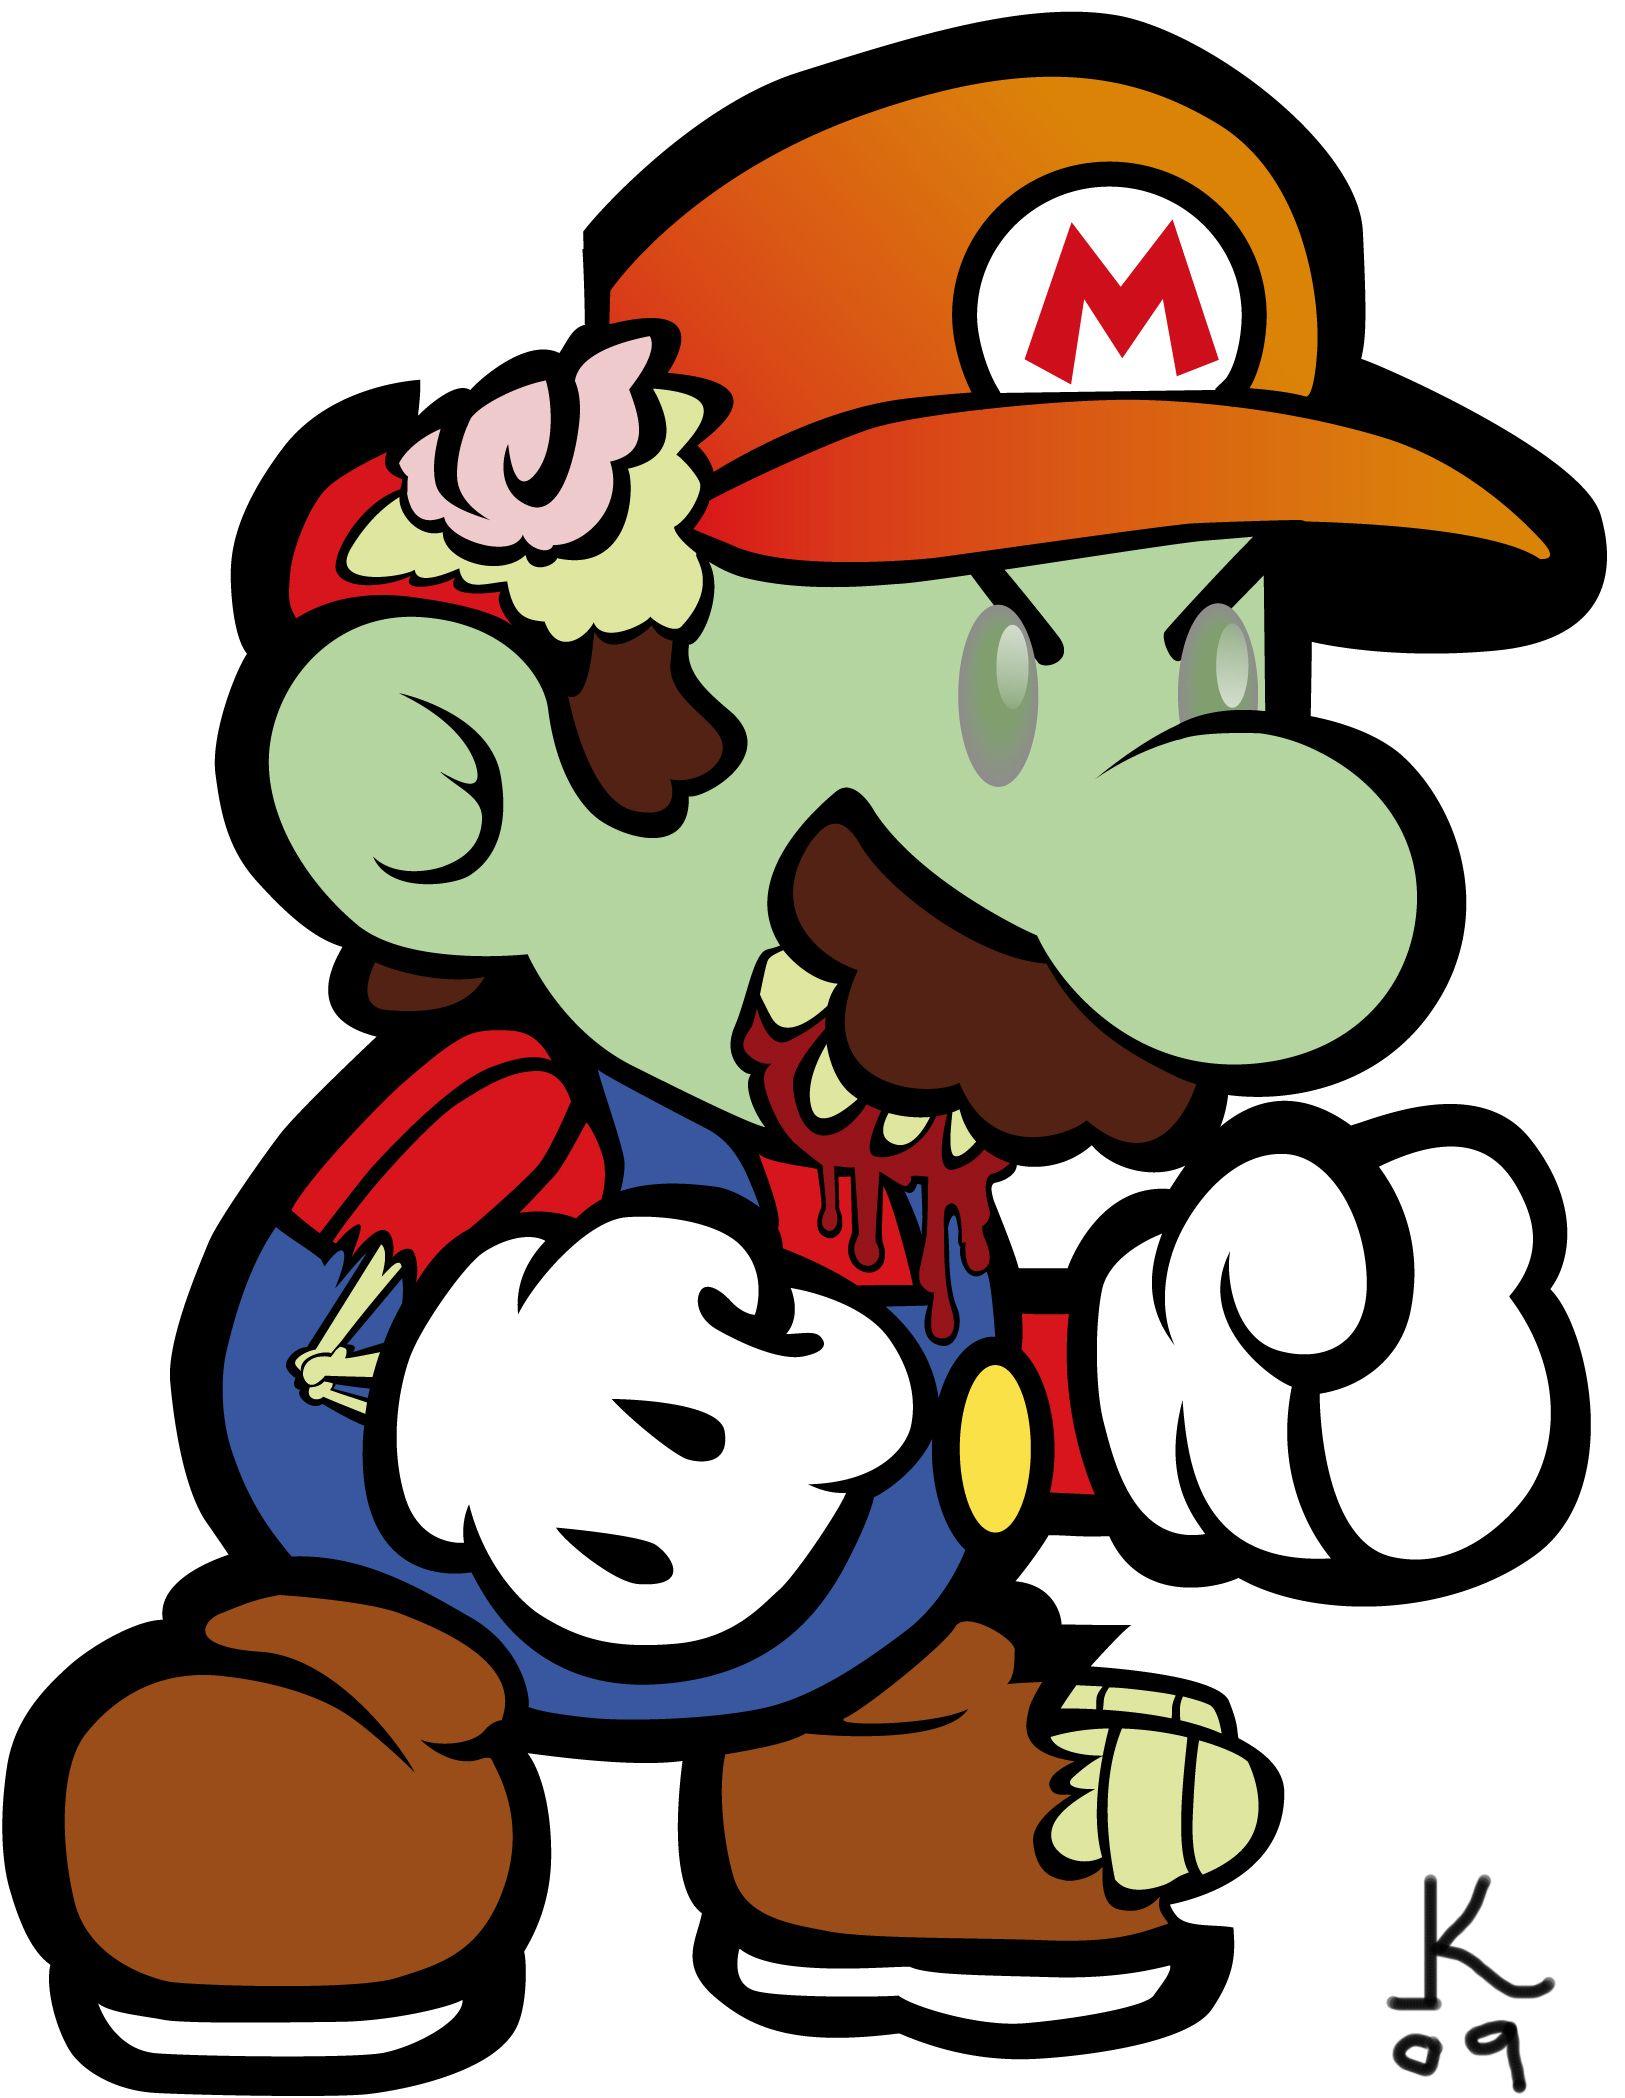 Zombie Mario | Zombie | Pinterest | Zombie cartoon ...